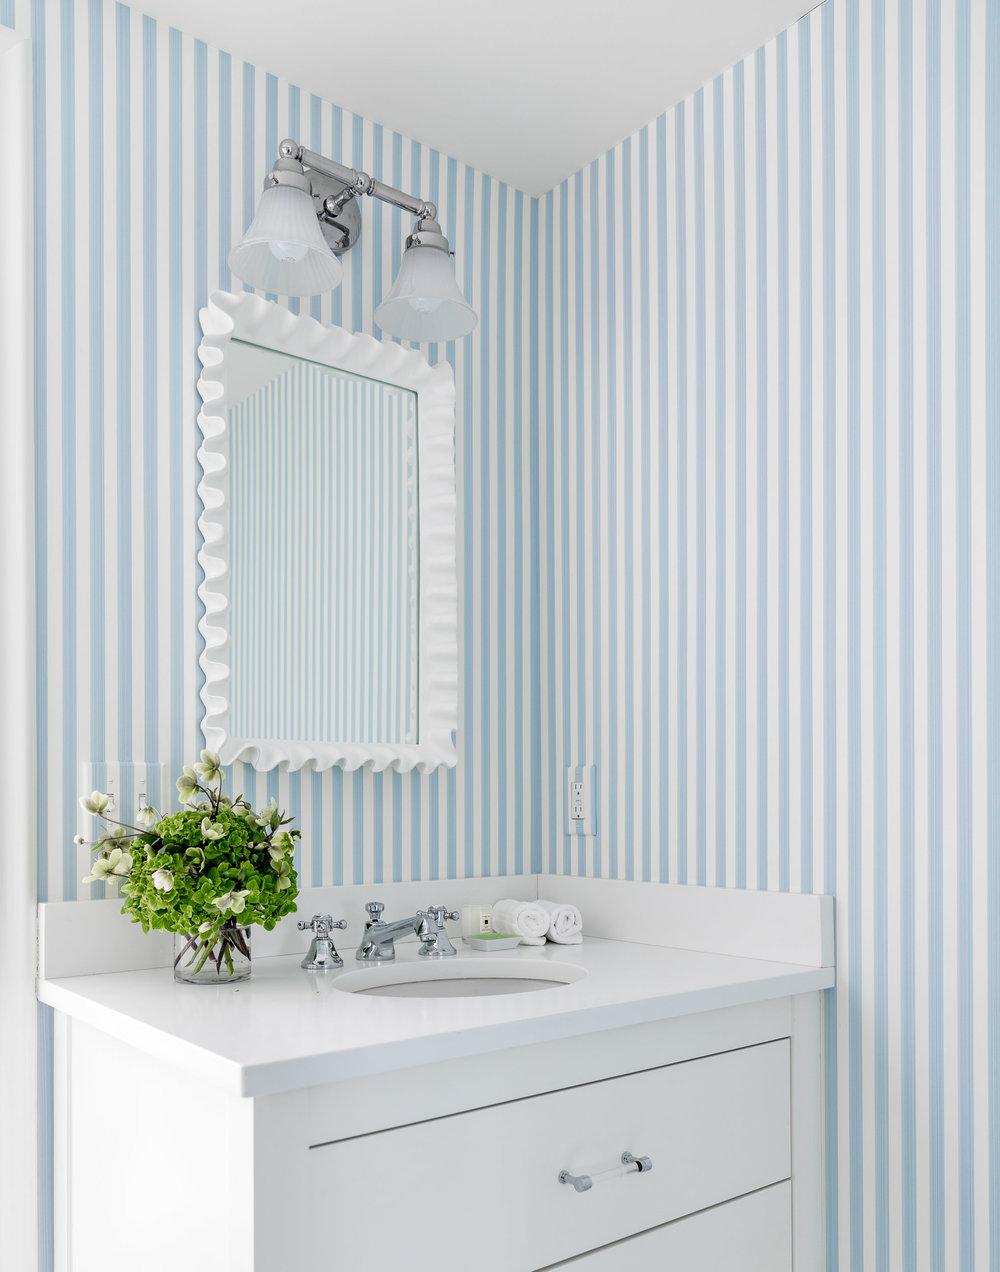 Blue & white striped bathroom wall.